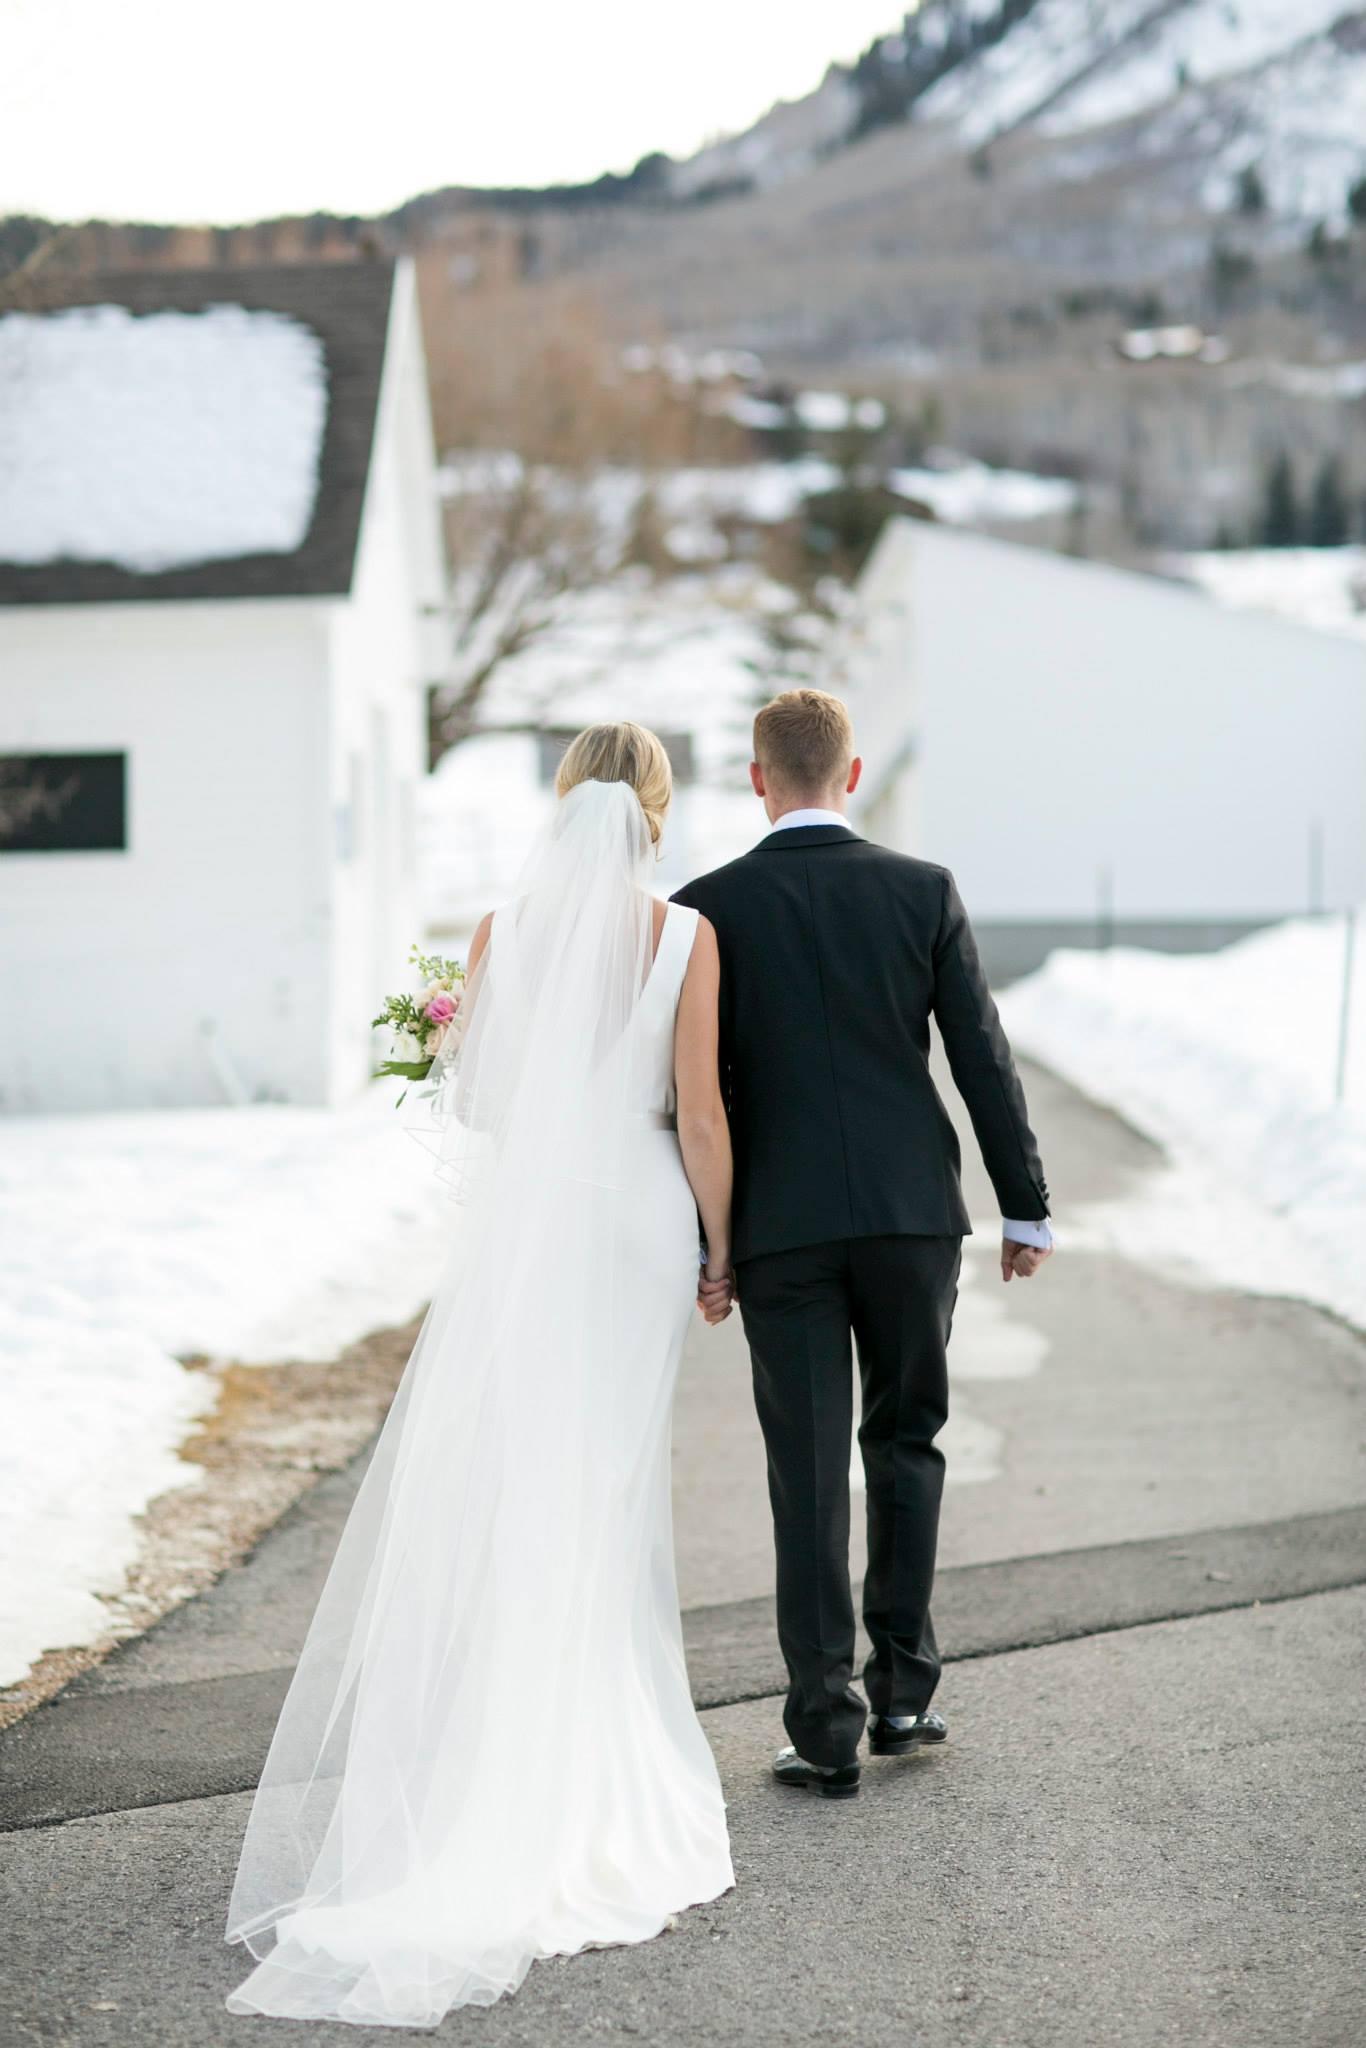 Amelia-Park-City-winter-wedding-photo-Lauren-Michelle-Weddings-015.jpg